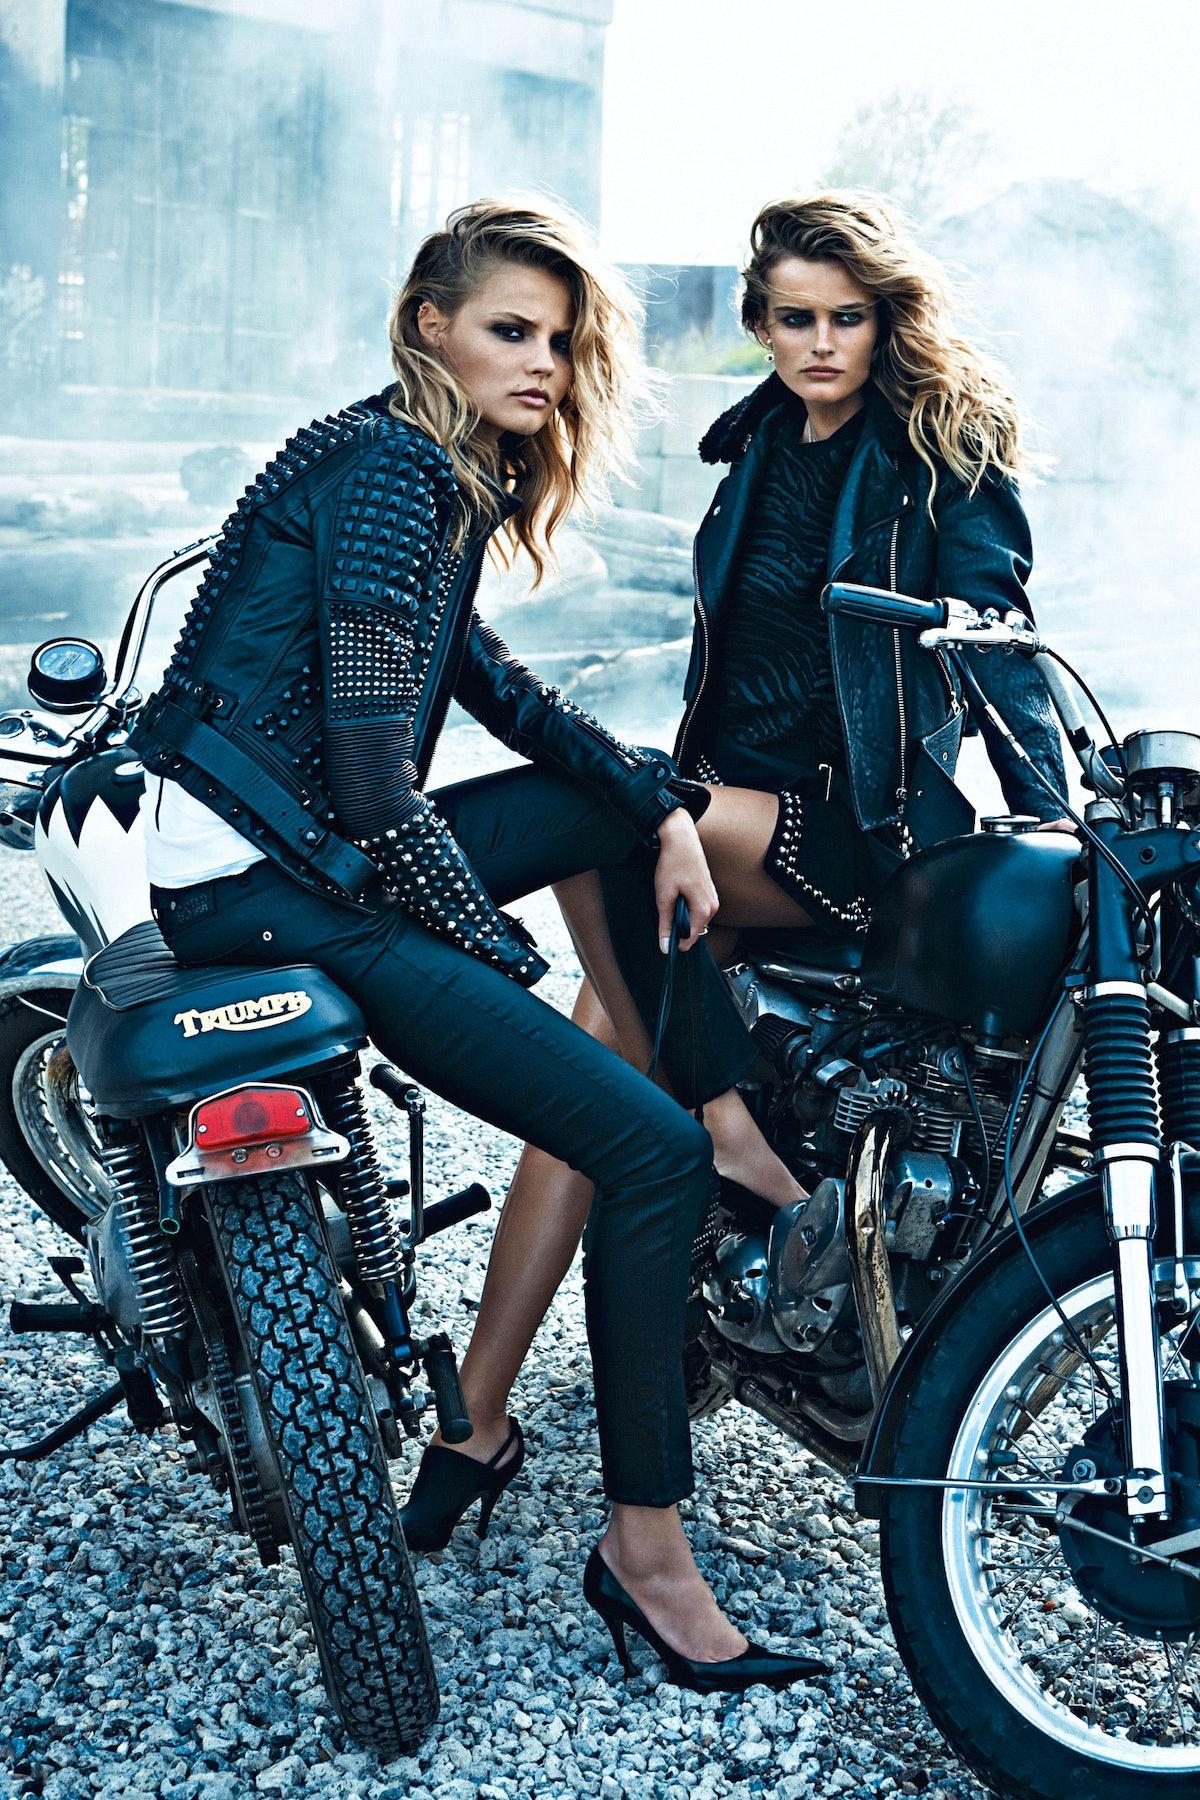 fass-biker-chic-fall-2013-07